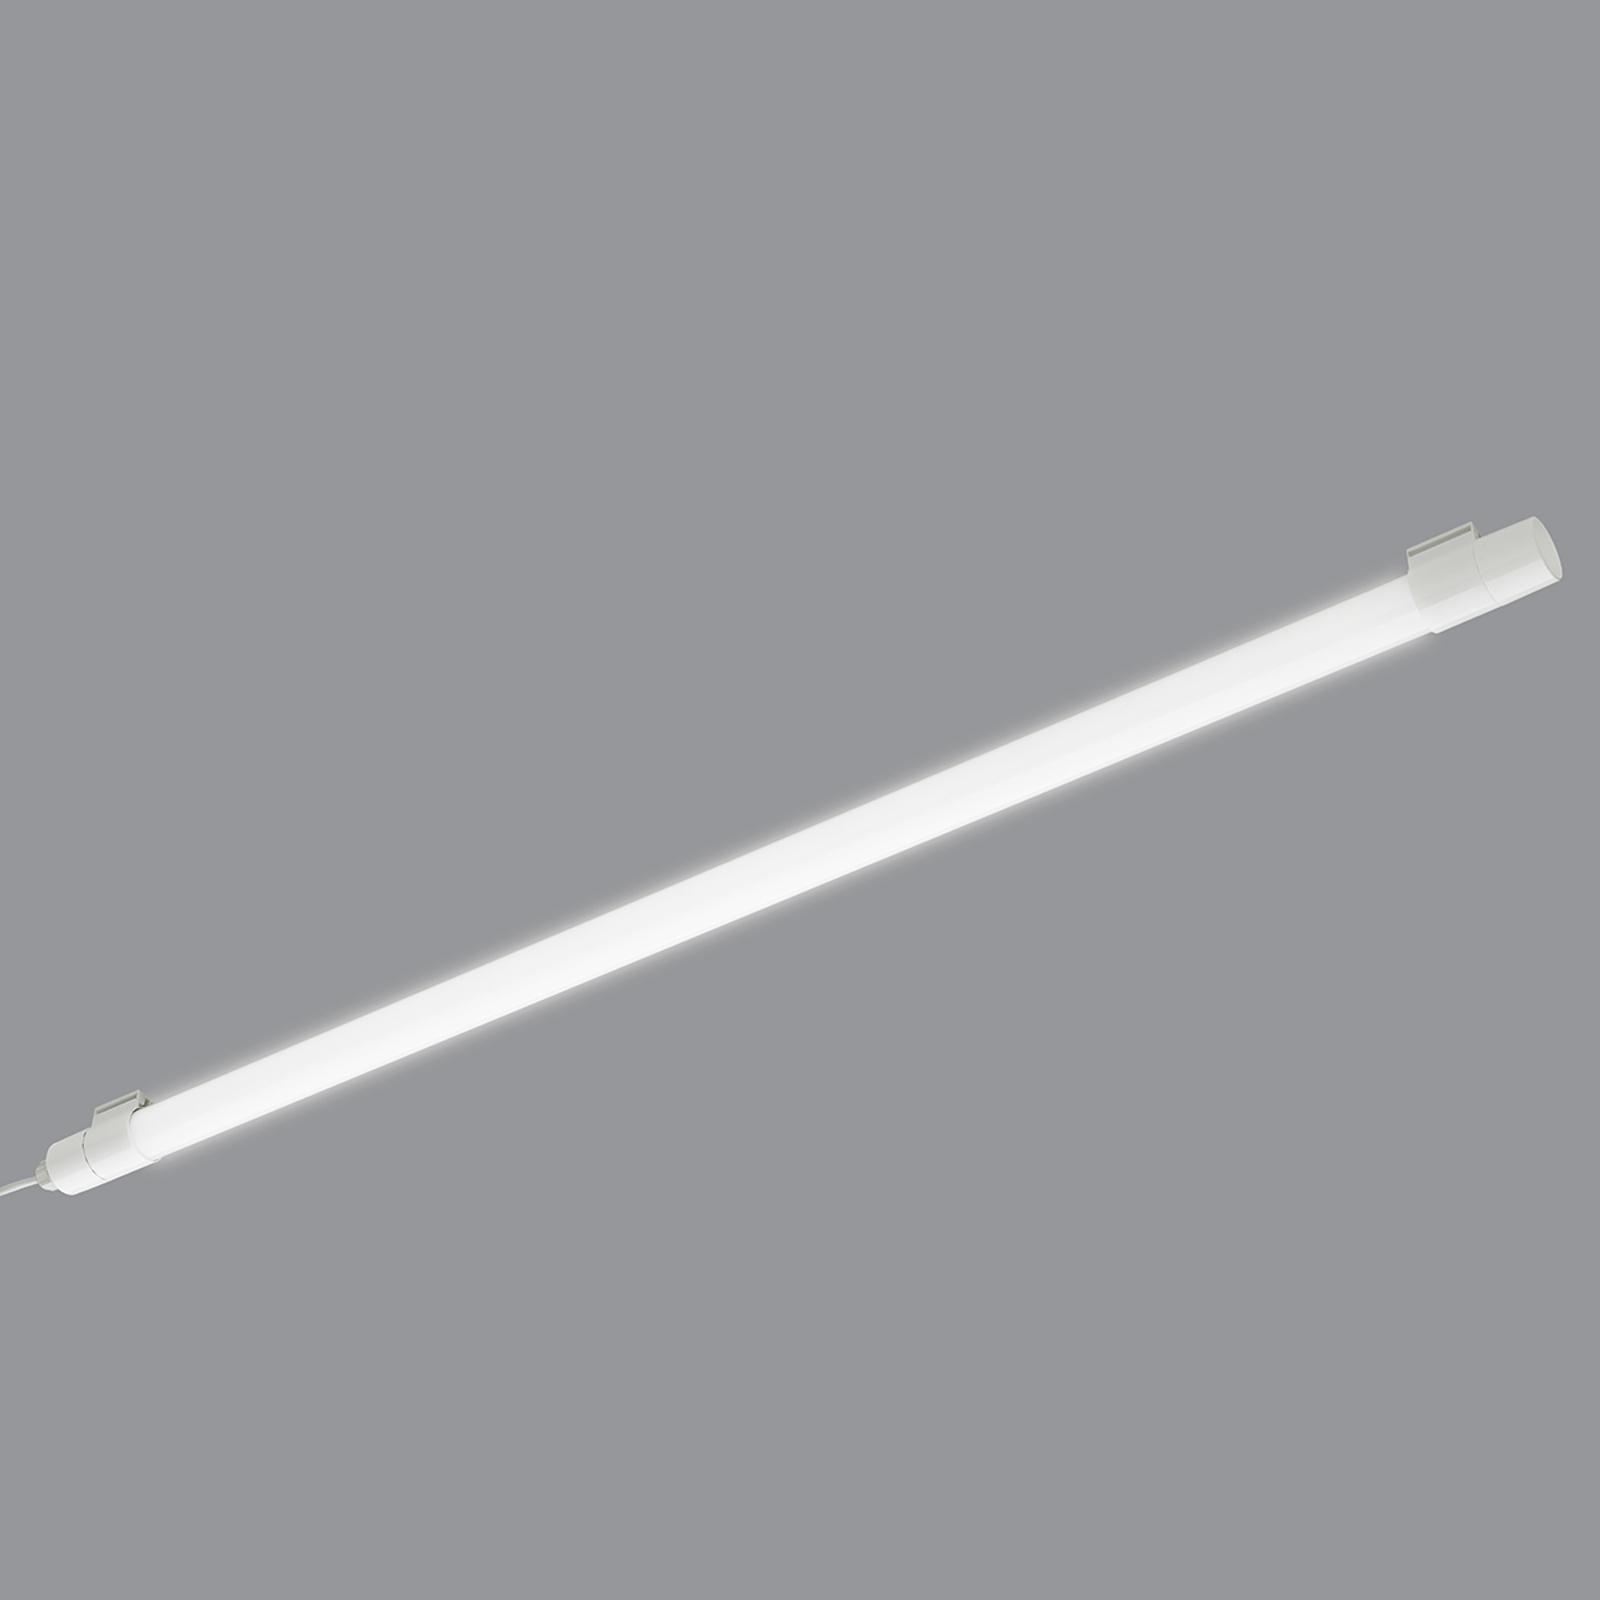 LED-valolista Start Batten IP65, 26 W, 3 000 K